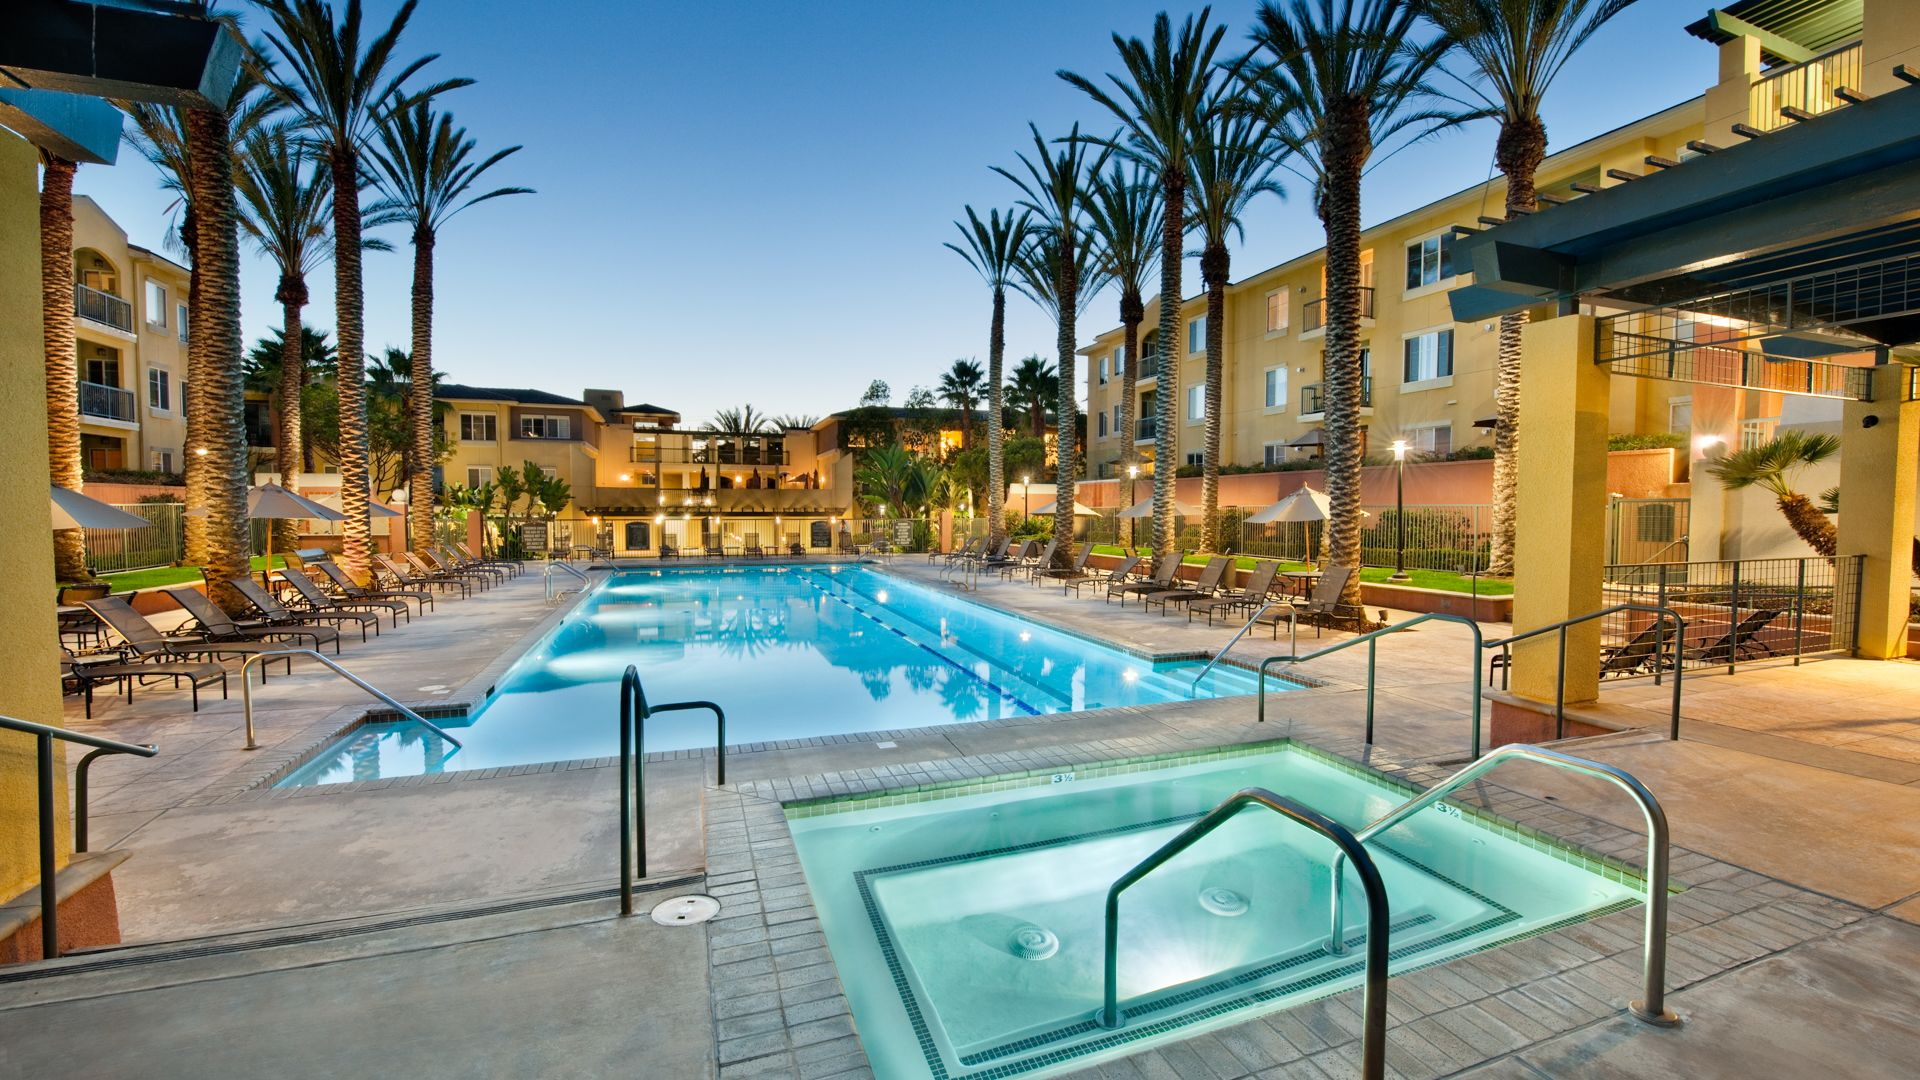 Marina 41 Apartments - Swimming Pool